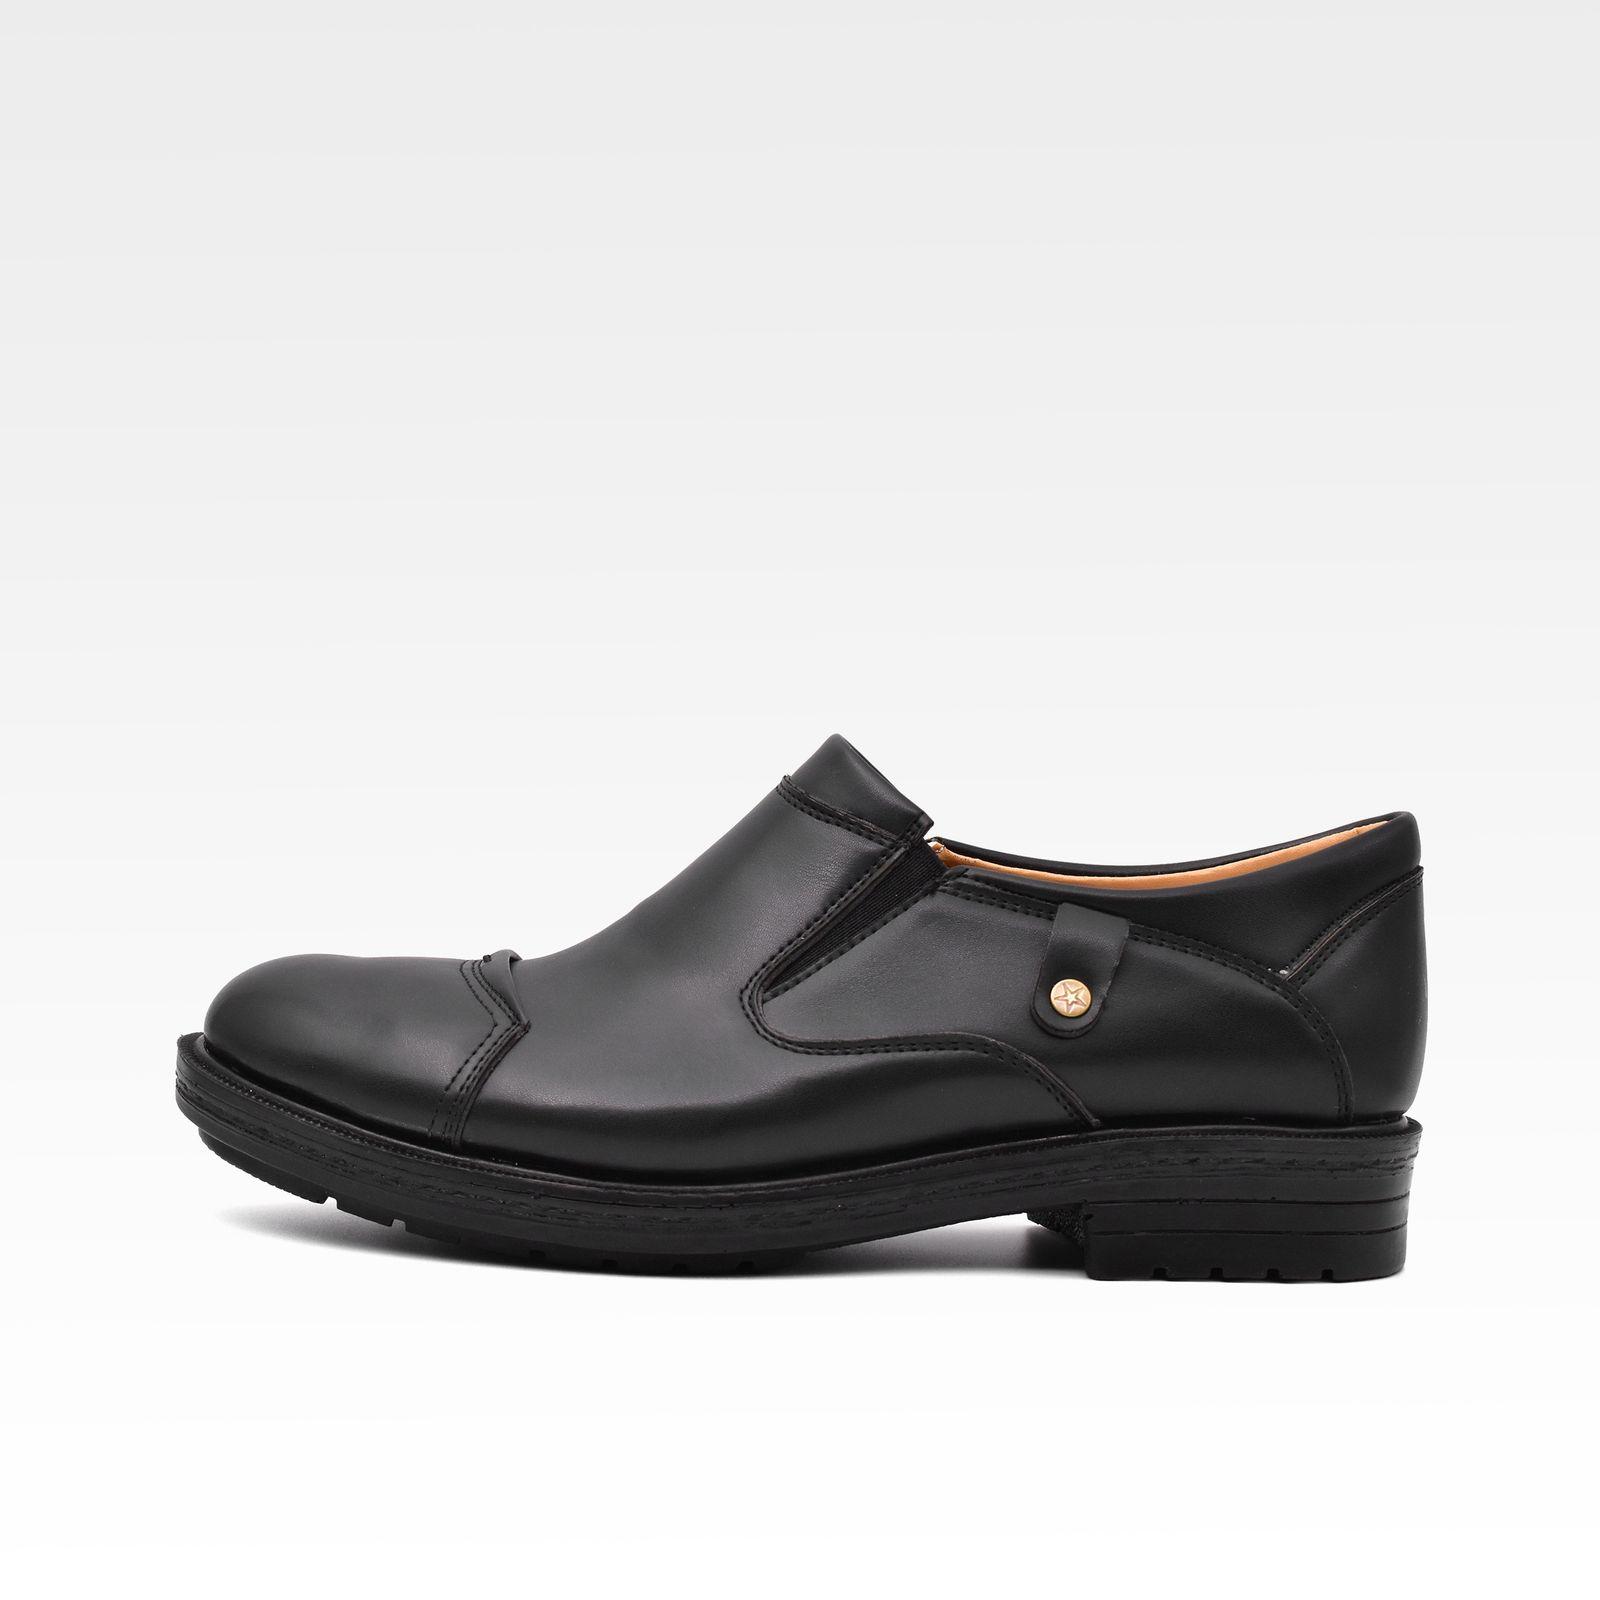 کفش مردانه سینگل مدل سهیل کد 6510 -  - 2